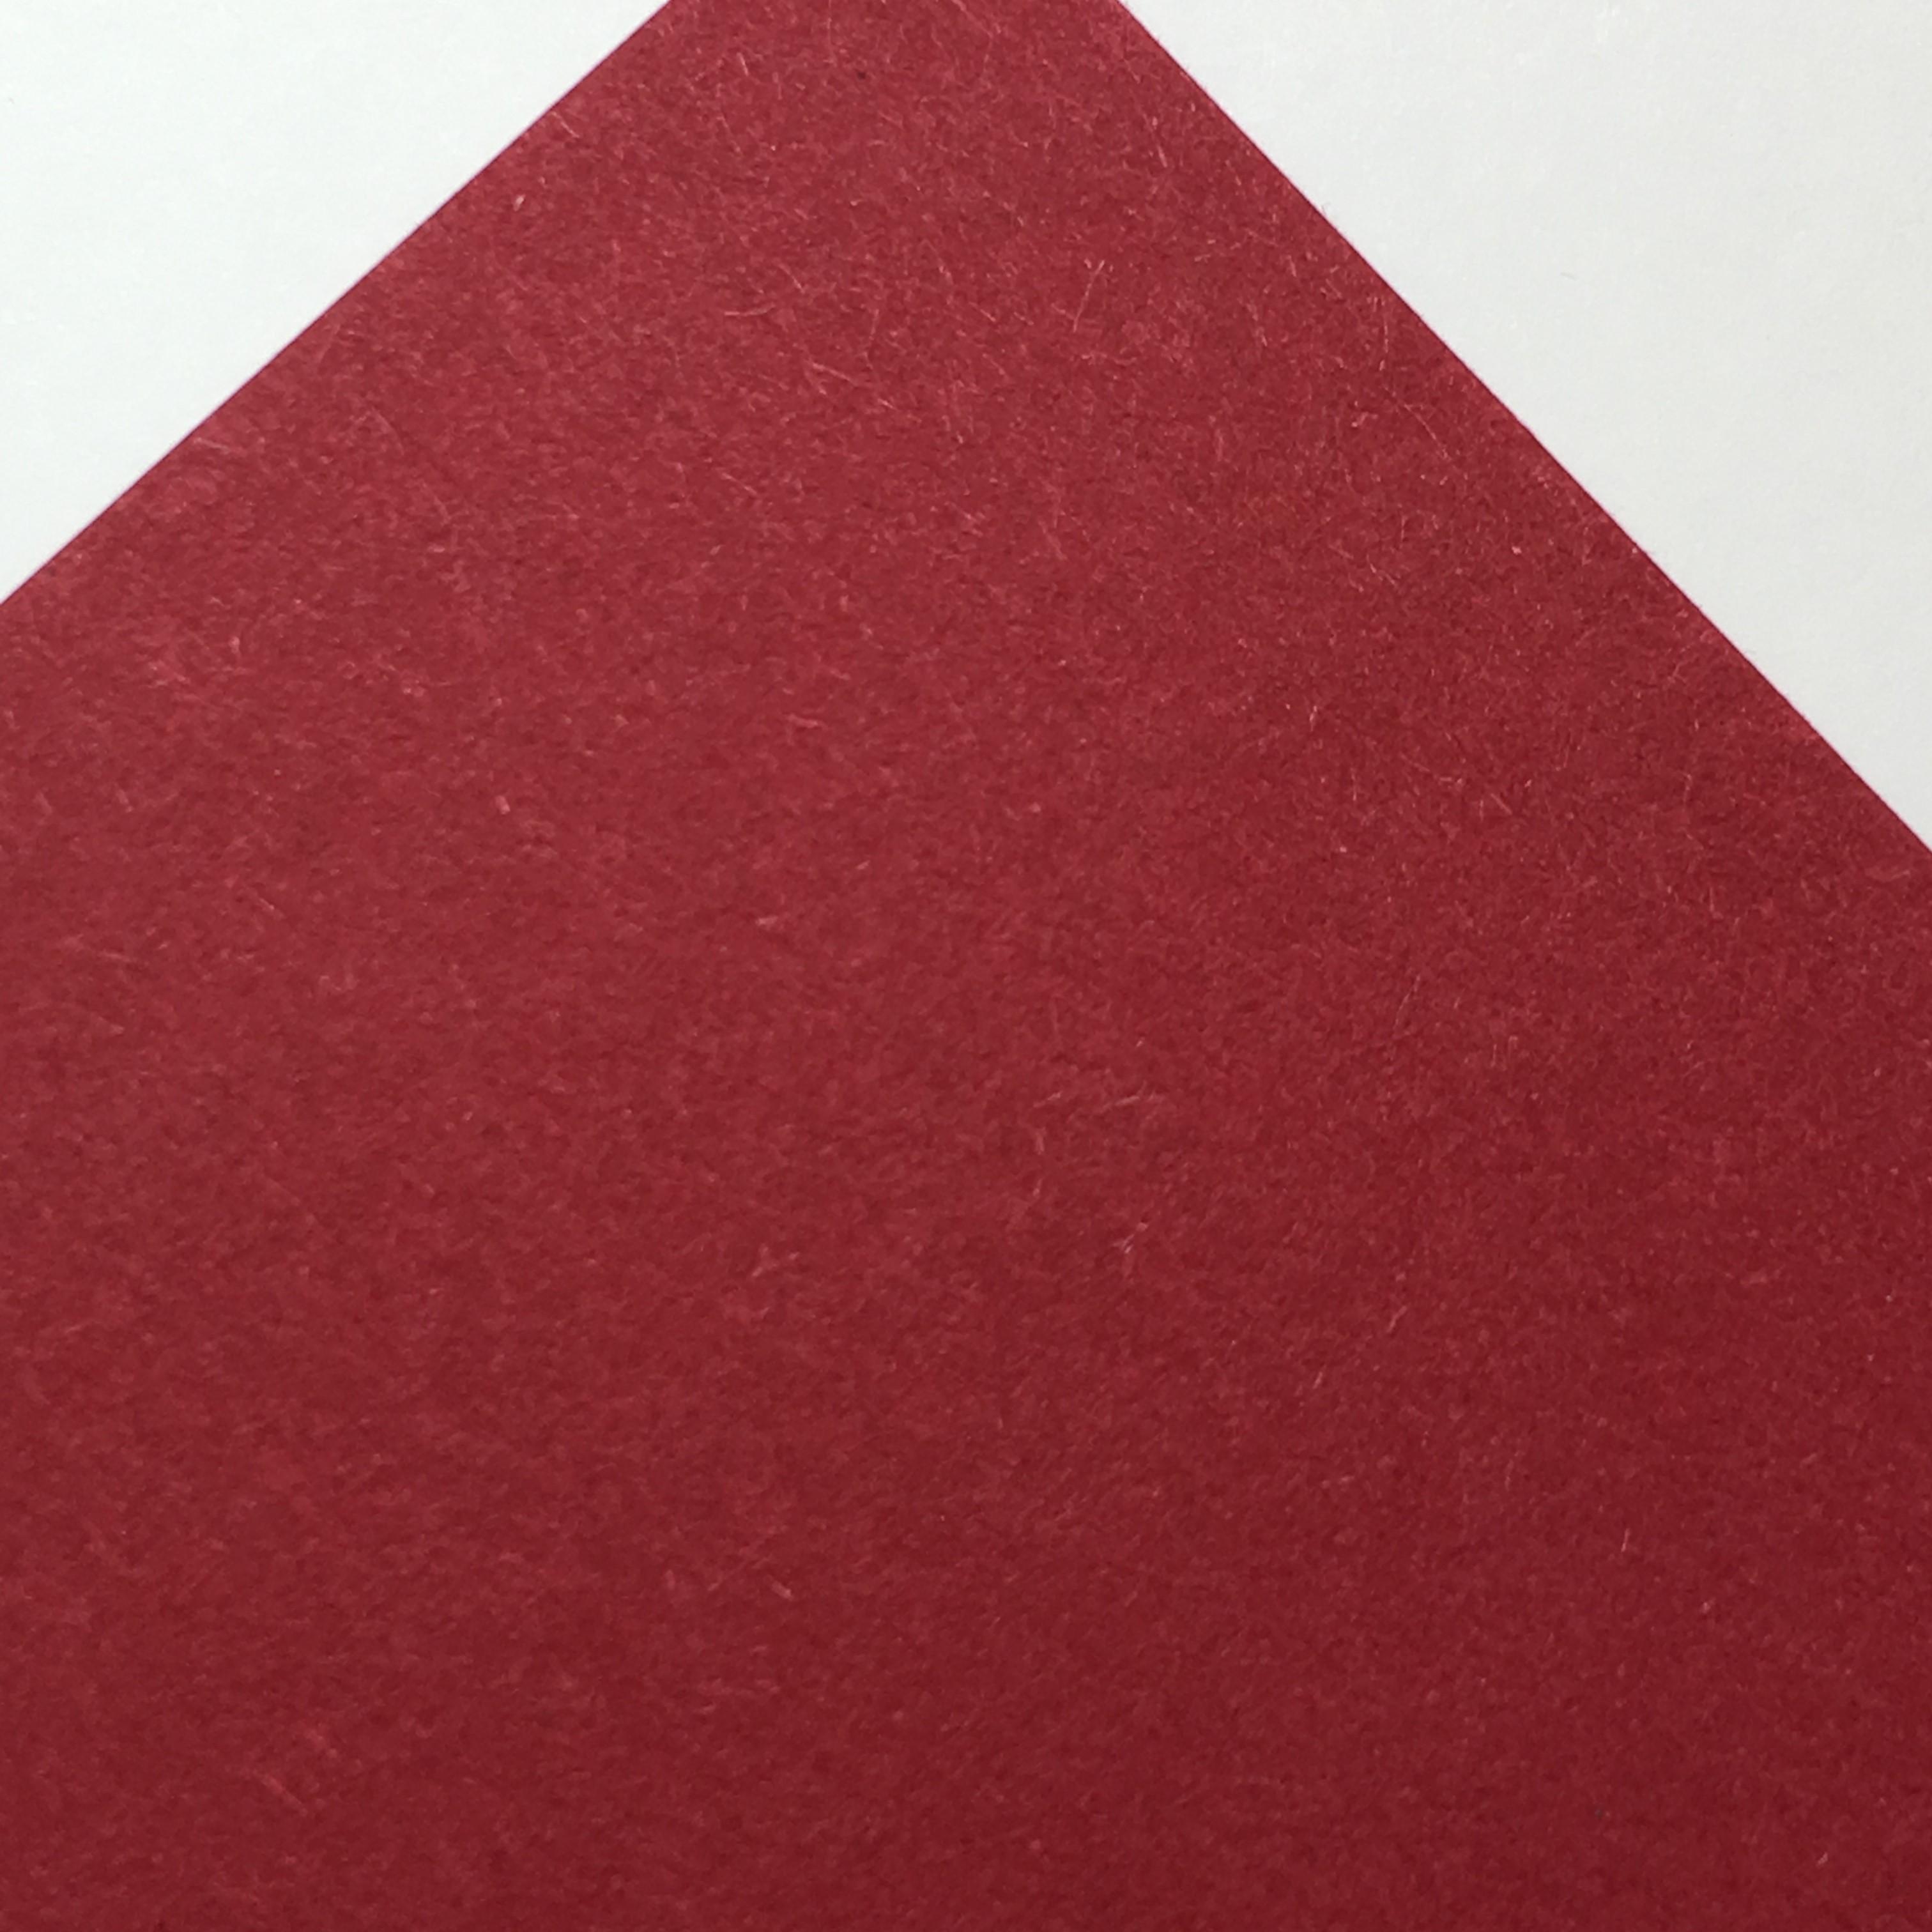 Бумага гладкая Creative board bordeaux, 120г/м2, 30х30